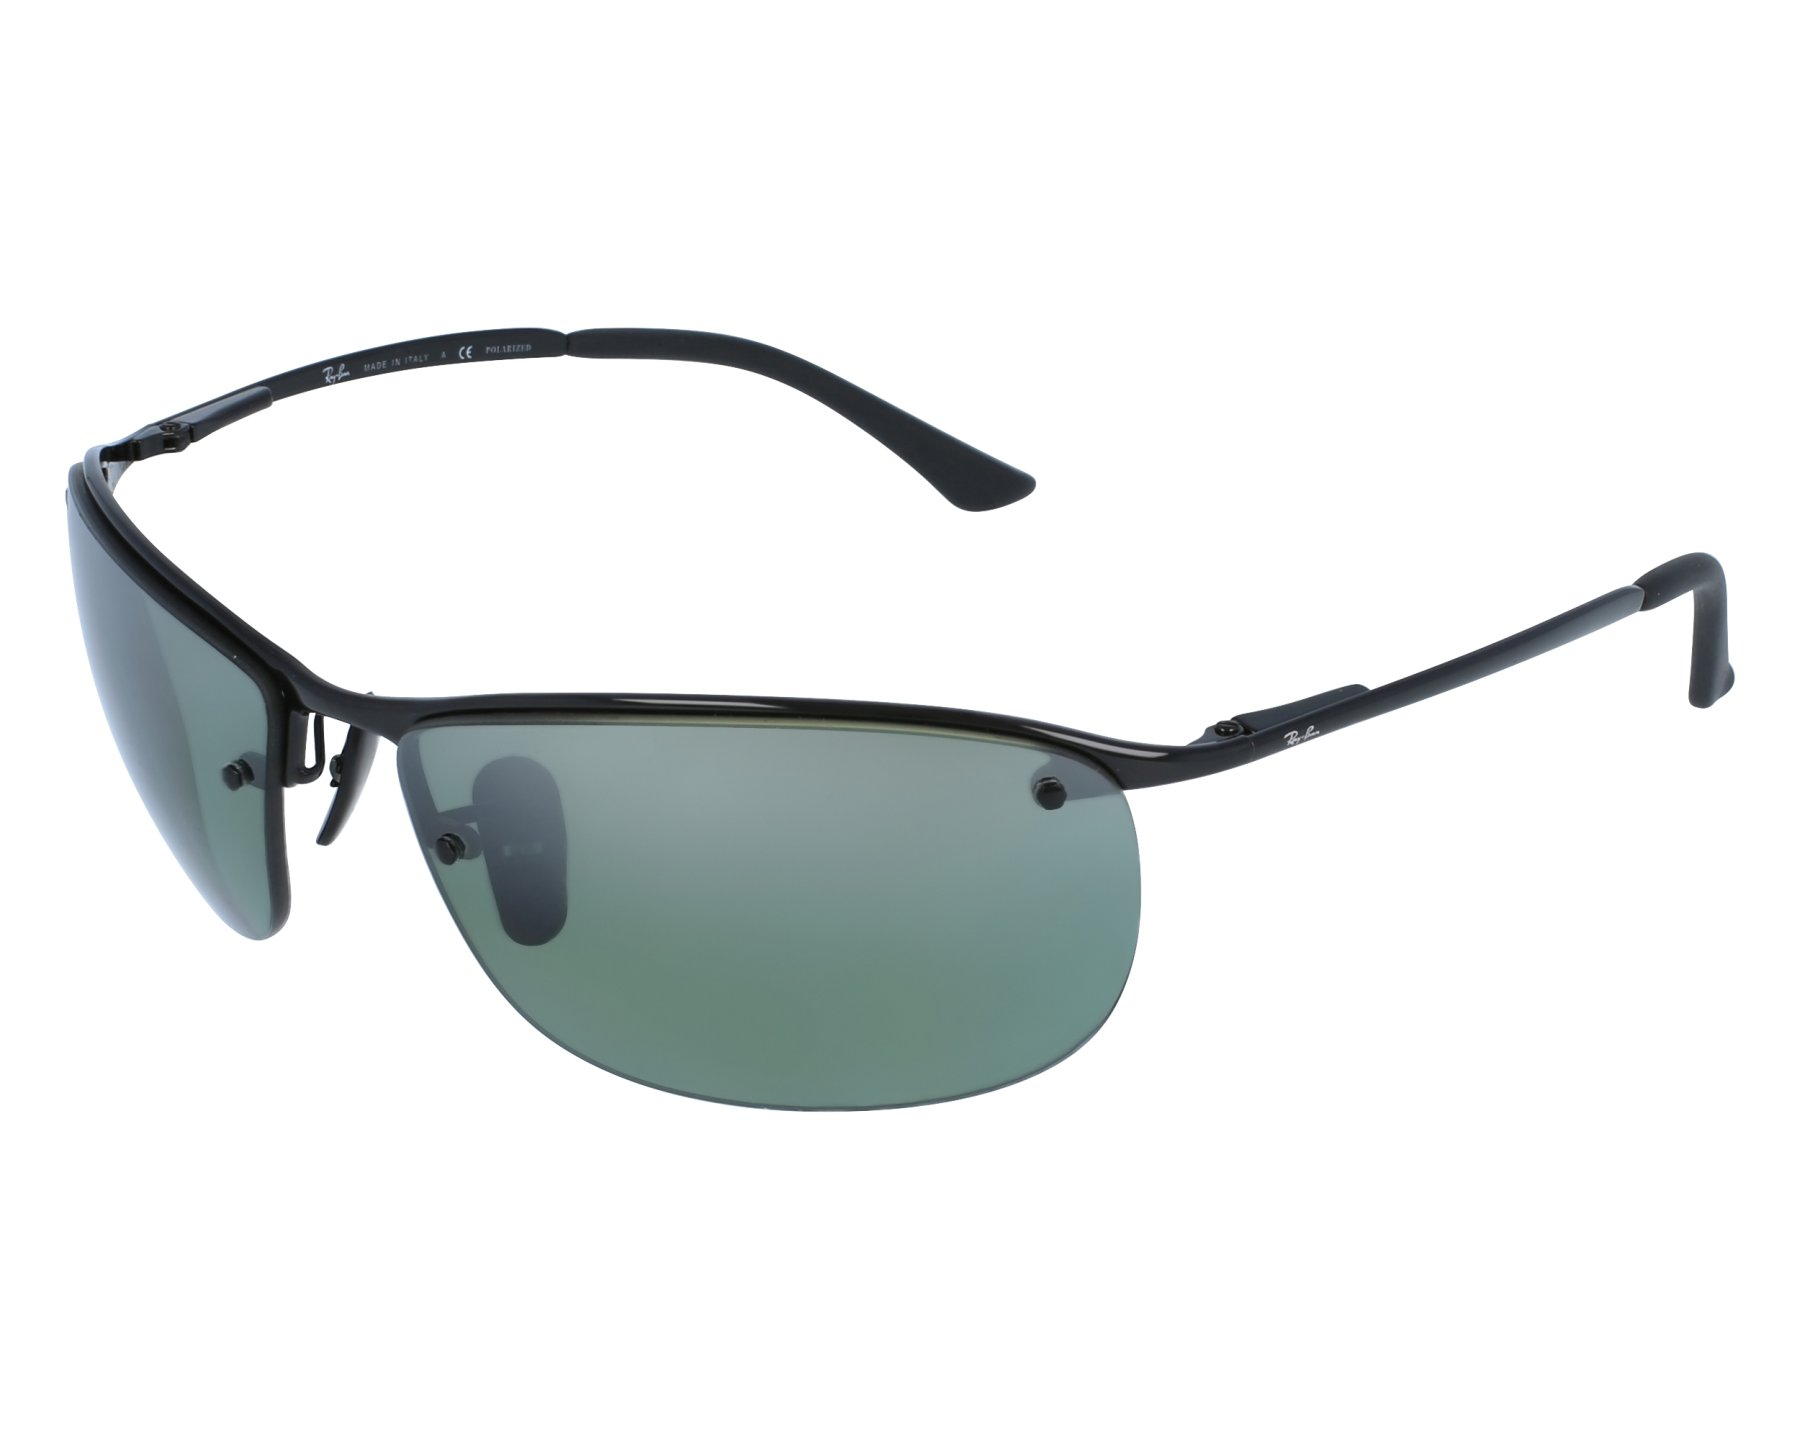 Sunglasses Ray-Ban RB-3542 002 5L 63-15 Black front view 51d96fbcf20b